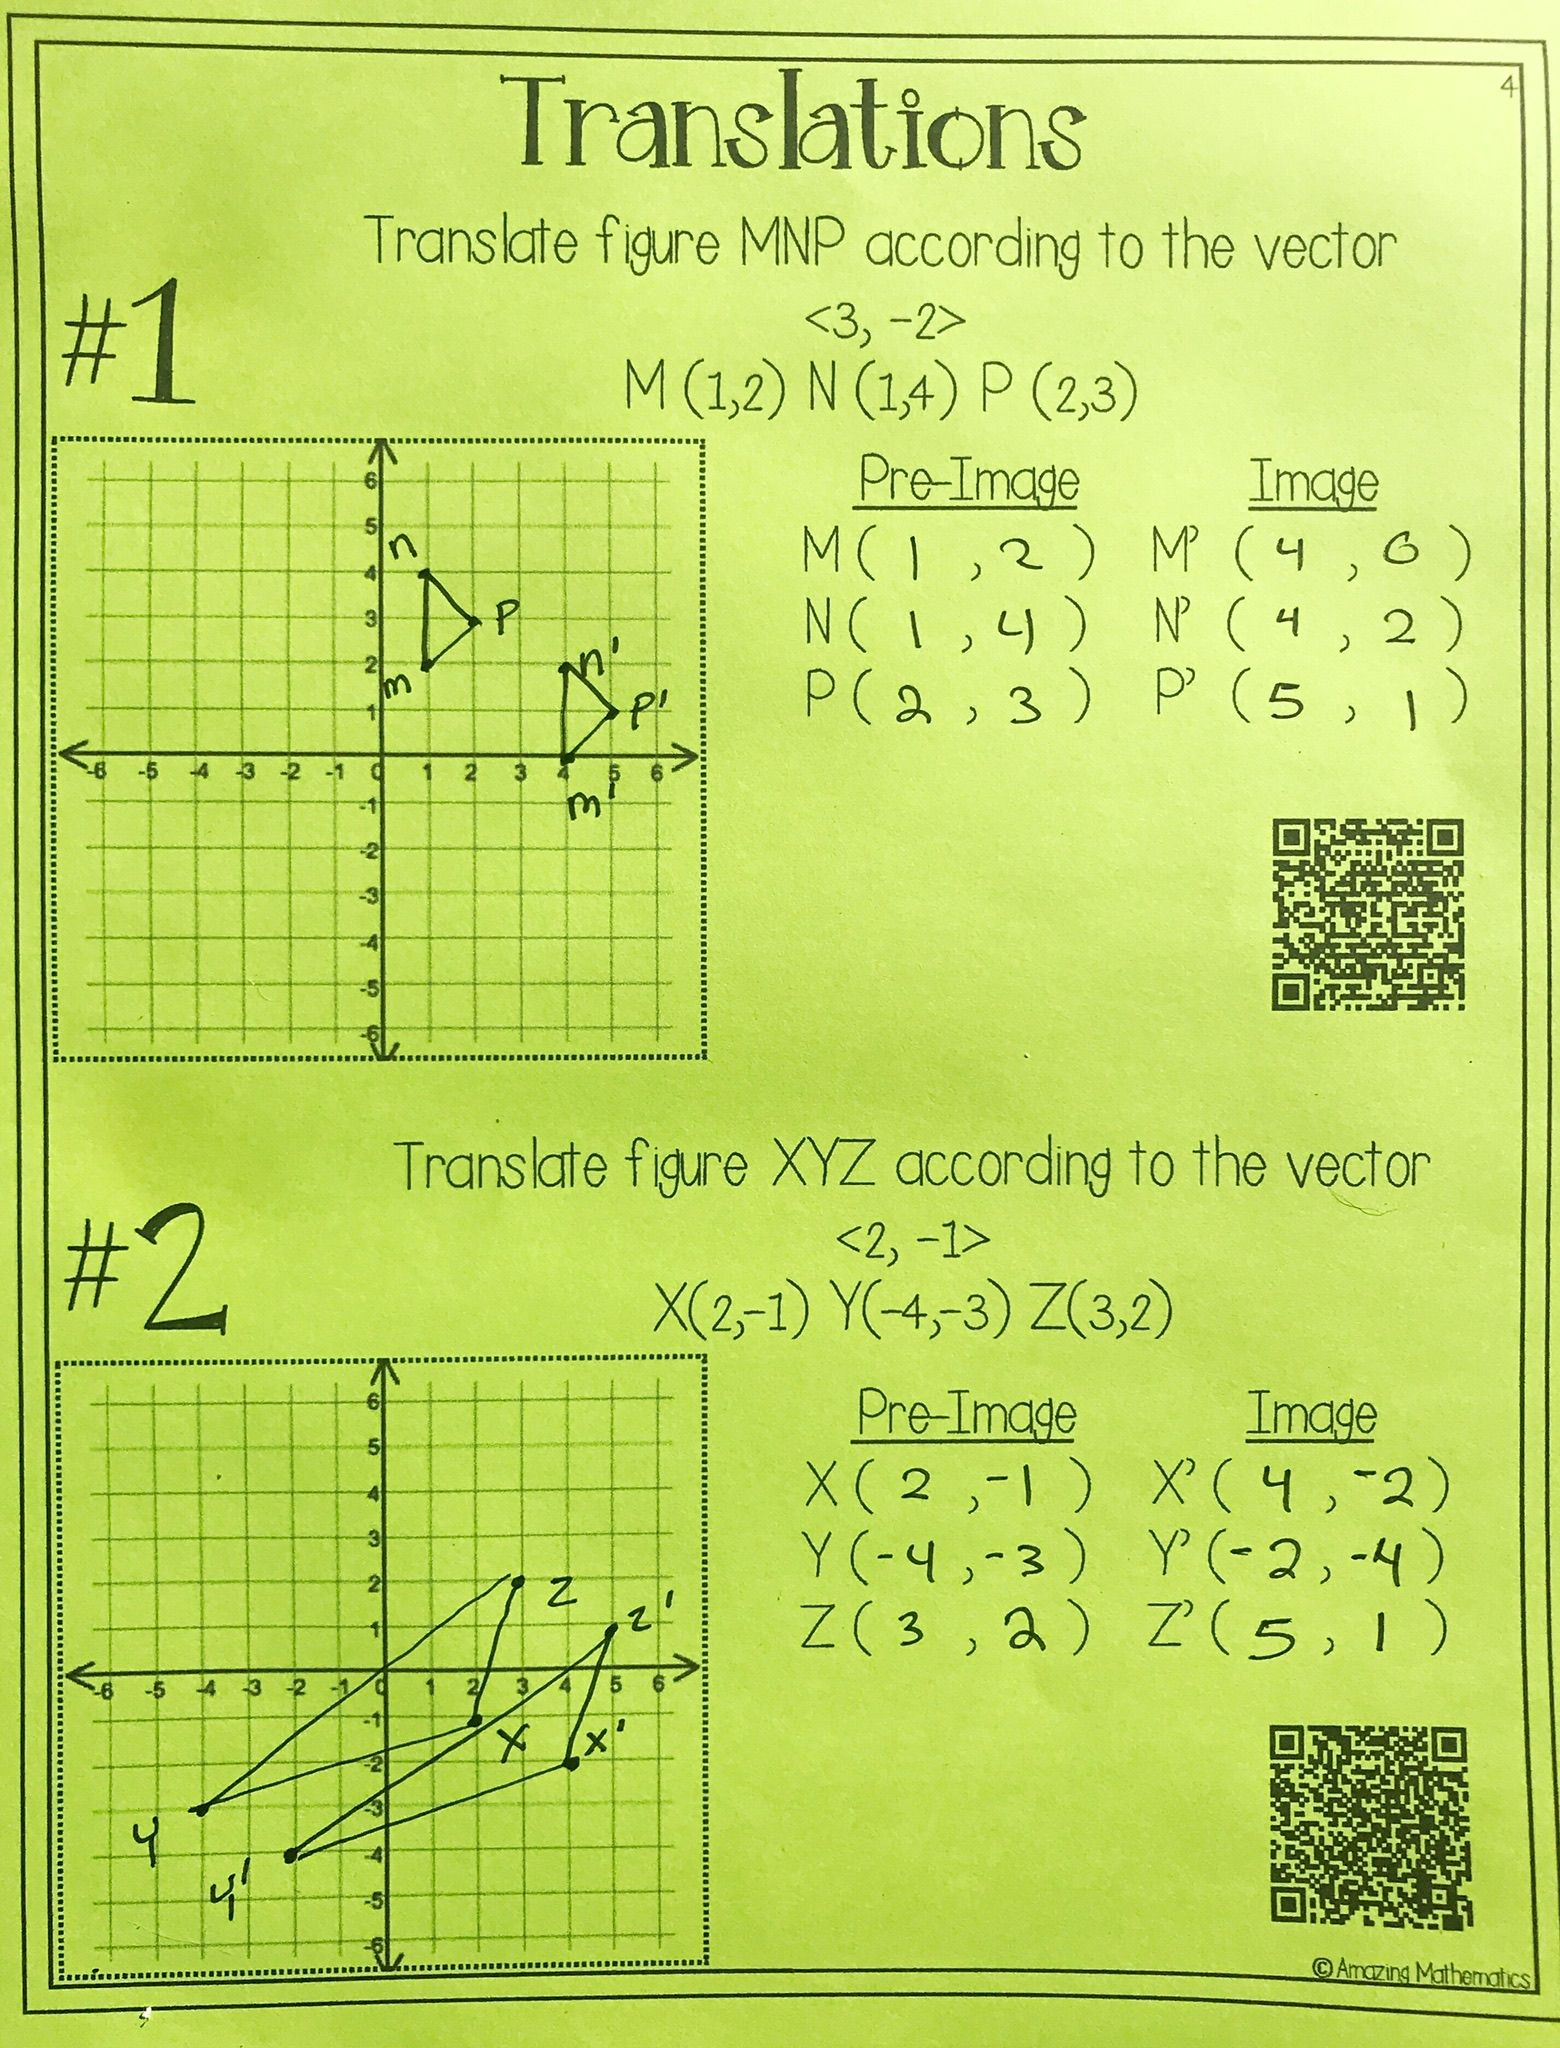 medium resolution of HS Geometry Transformations Workbook ~ Translations